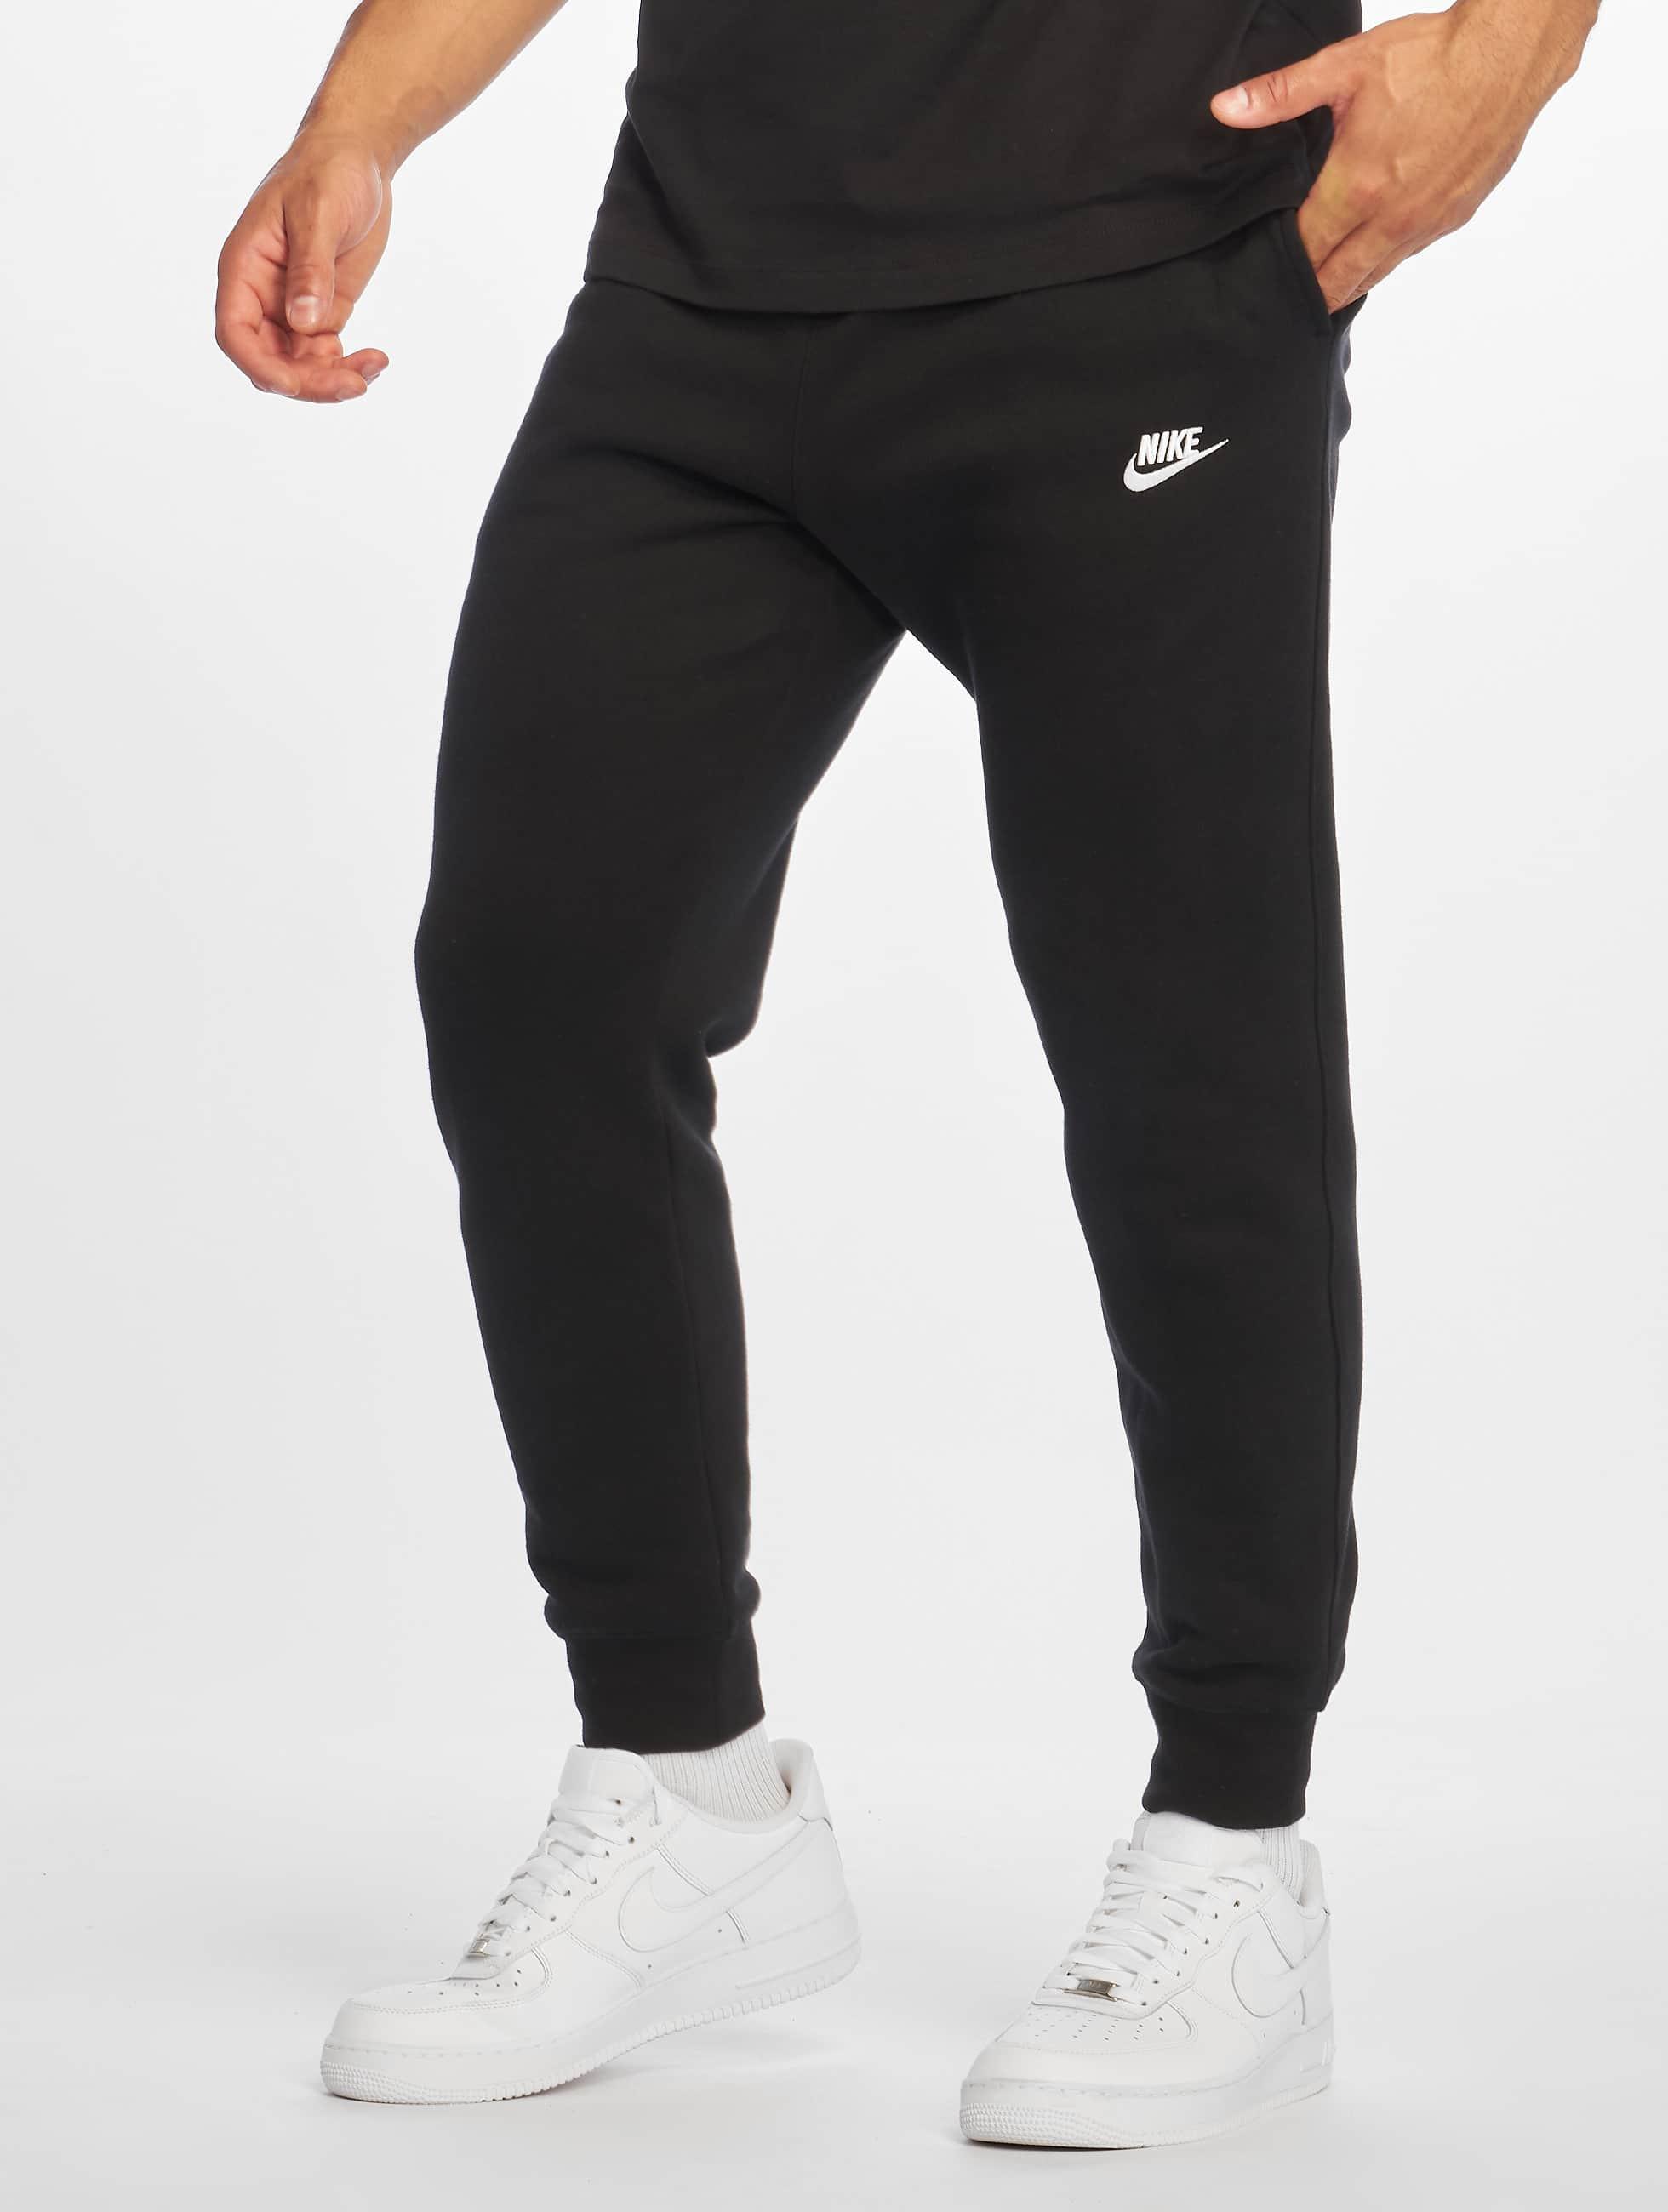 luego Incompetencia Teleférico  Nike | Jogger BB noir Homme Jogging 680043